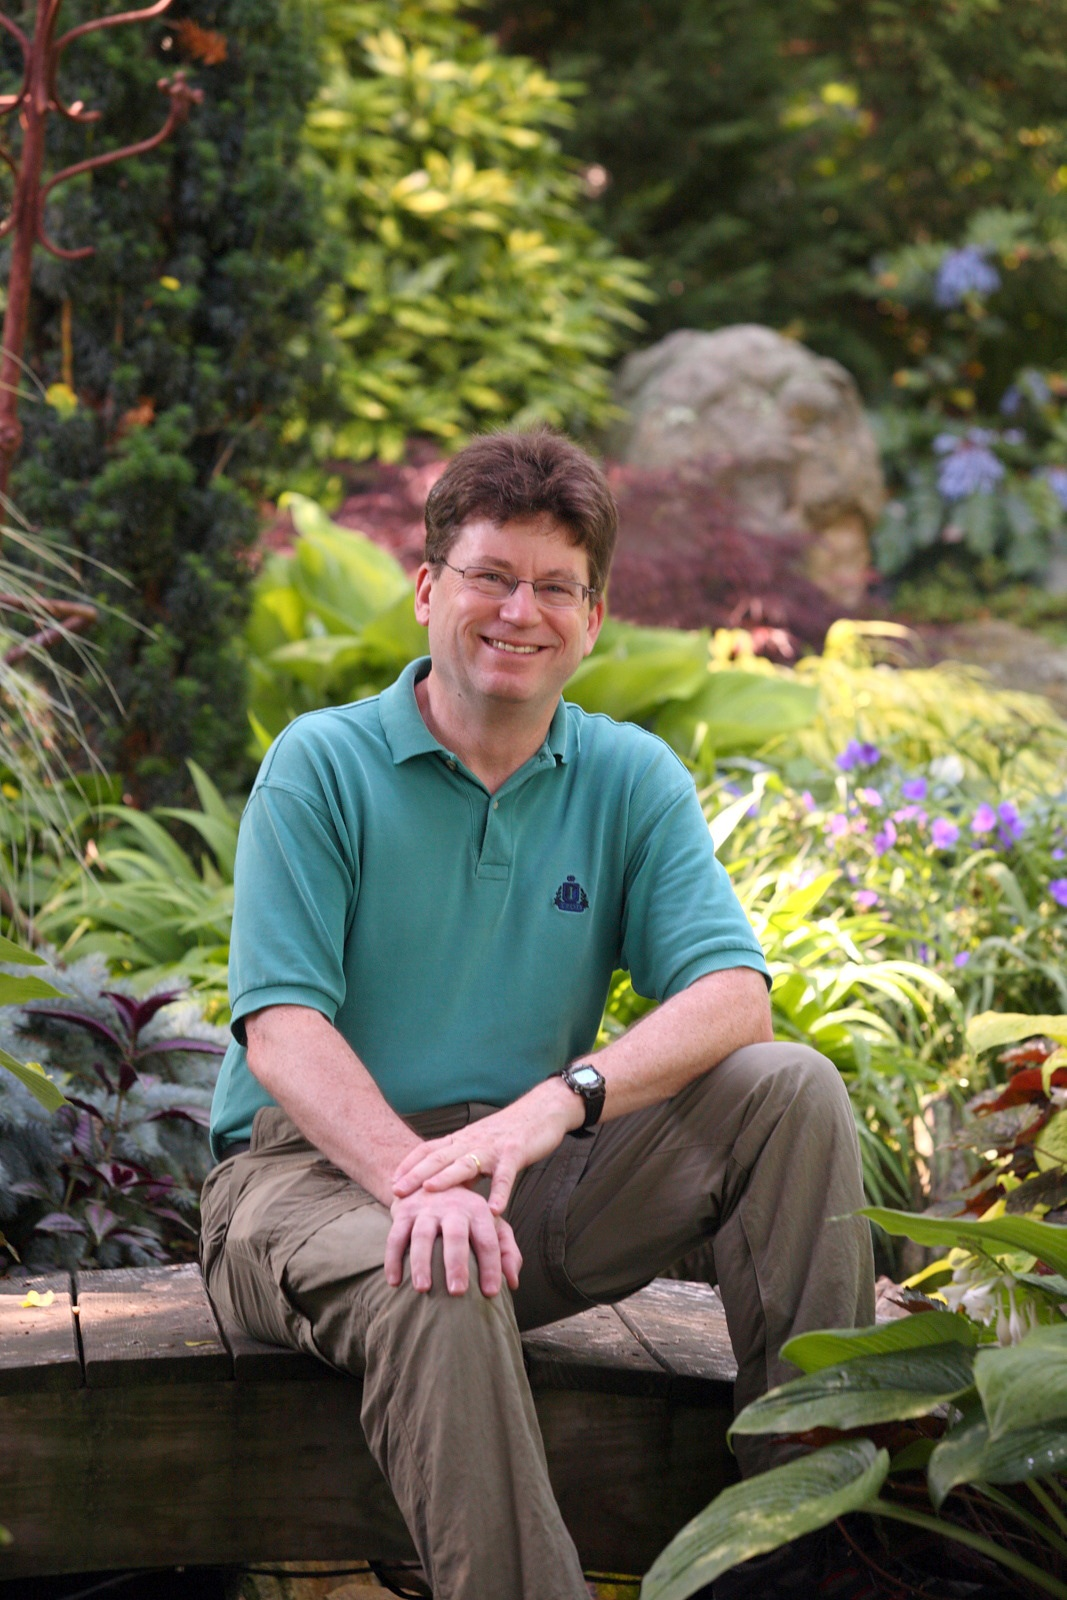 Steve Bender aka The Grumpy Gardener at Southern Living